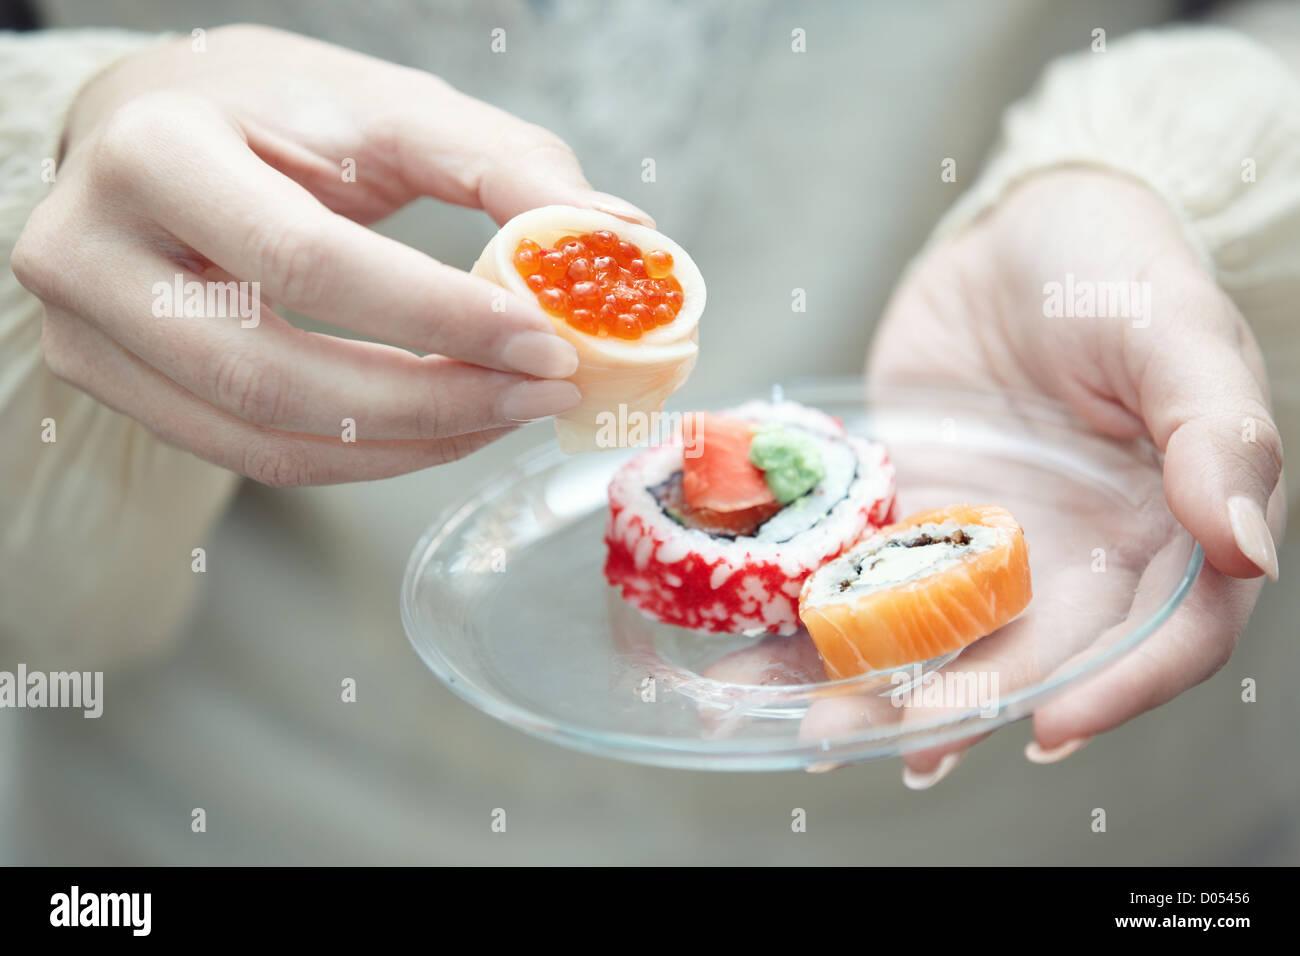 Lugar de celebración manos humanas con sushi Imagen De Stock